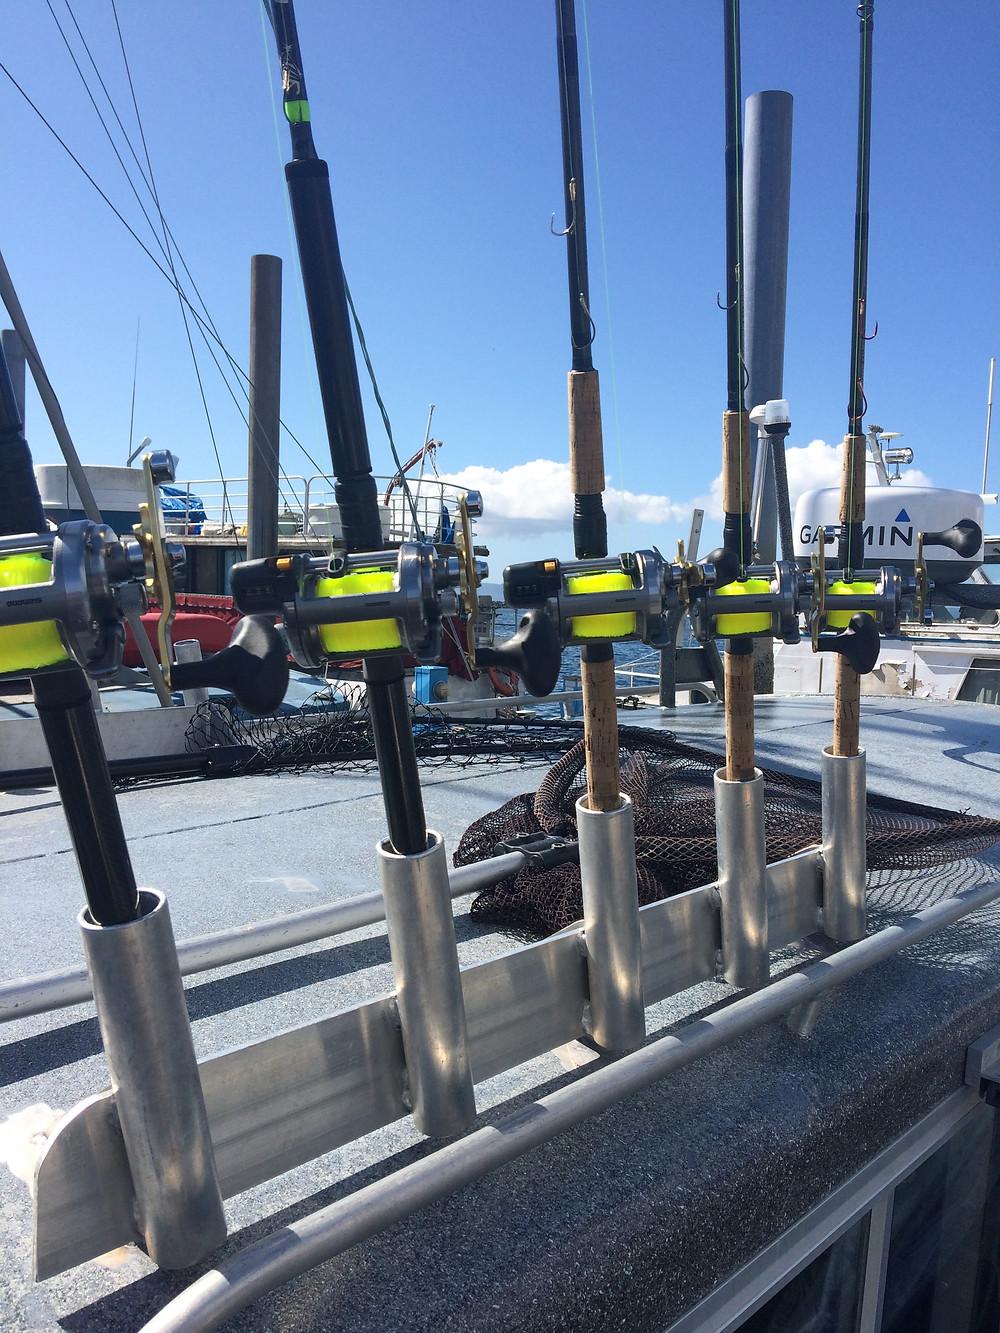 sitka fishing charters, fishing charters in sitka alaska